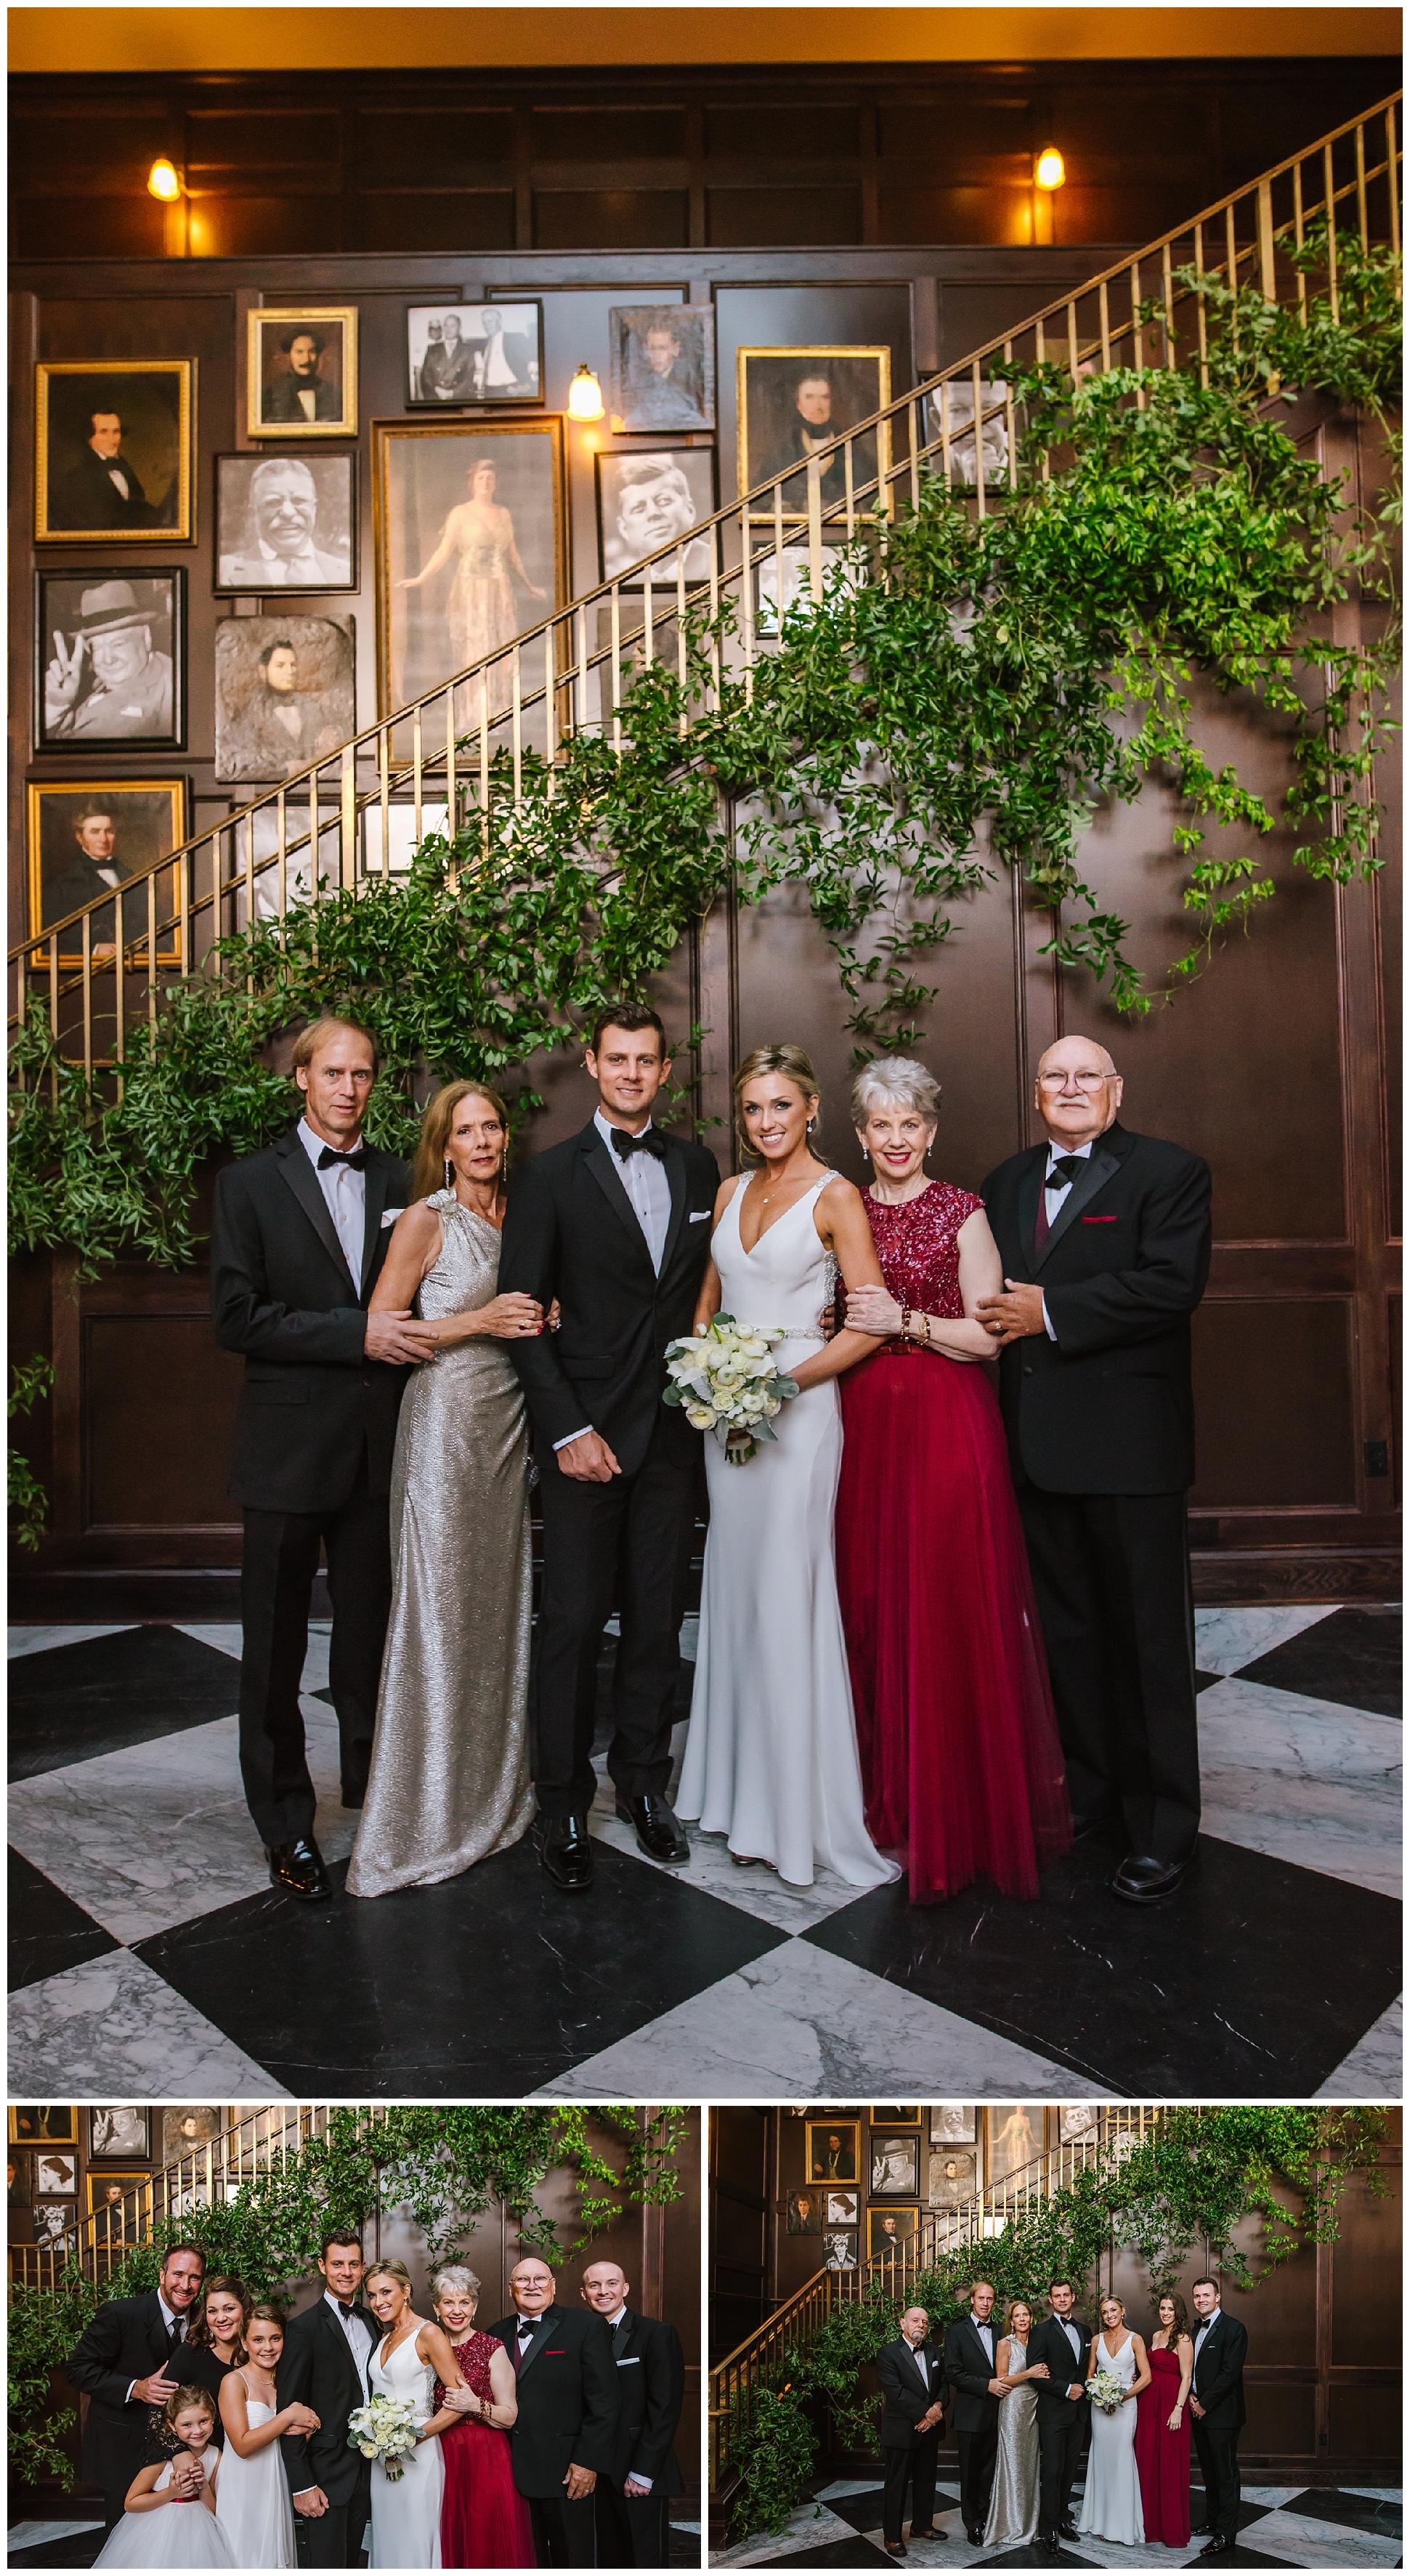 Oxford-exchange-wedding-photogapher-garland-candels-bookstore-burgandy-botanica_0033.jpg